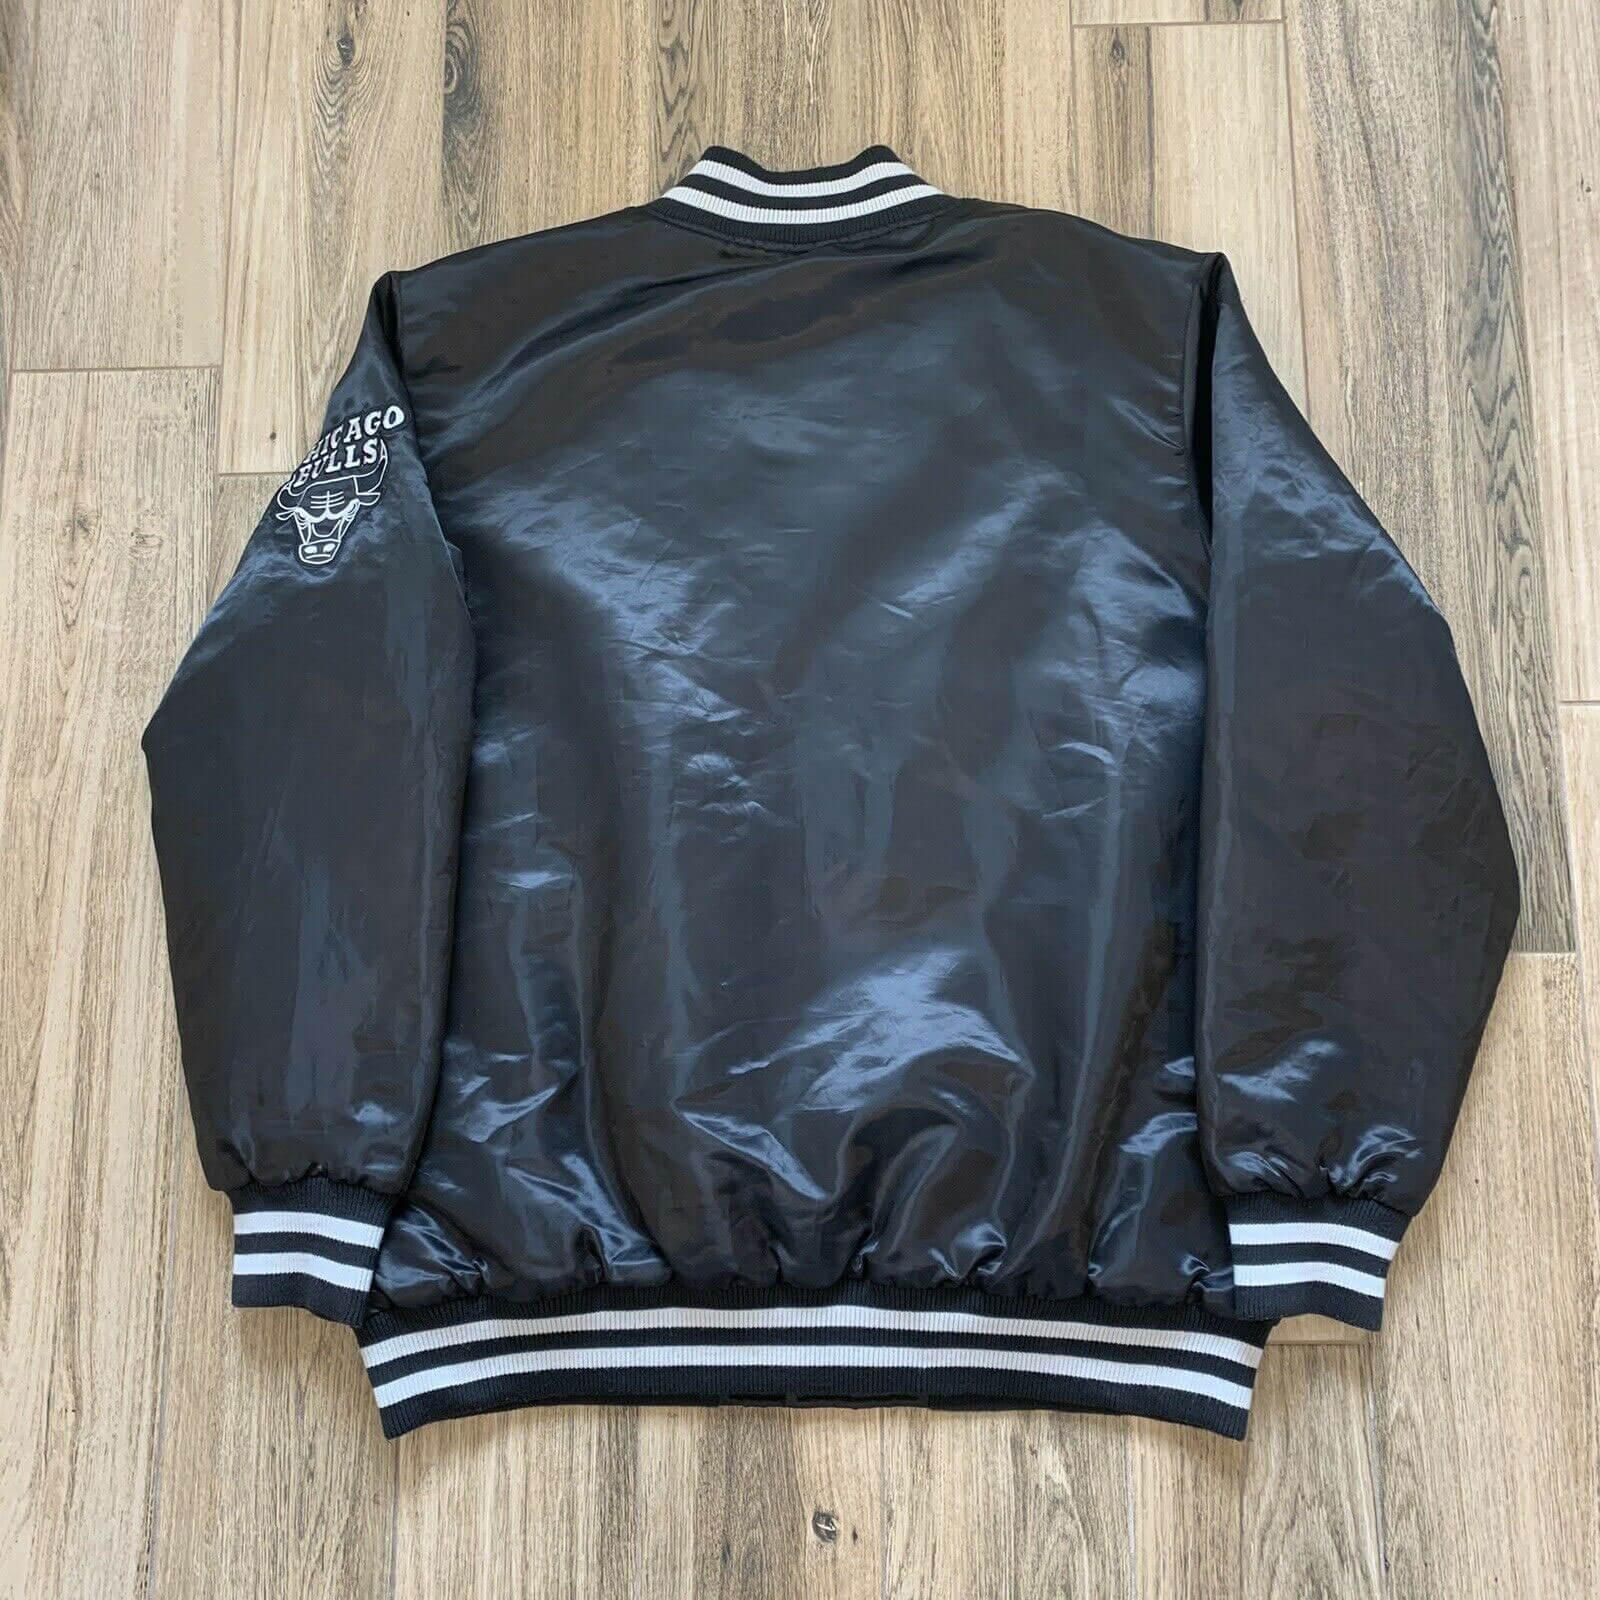 NBA Chicago Bulls Satin Black Jacket